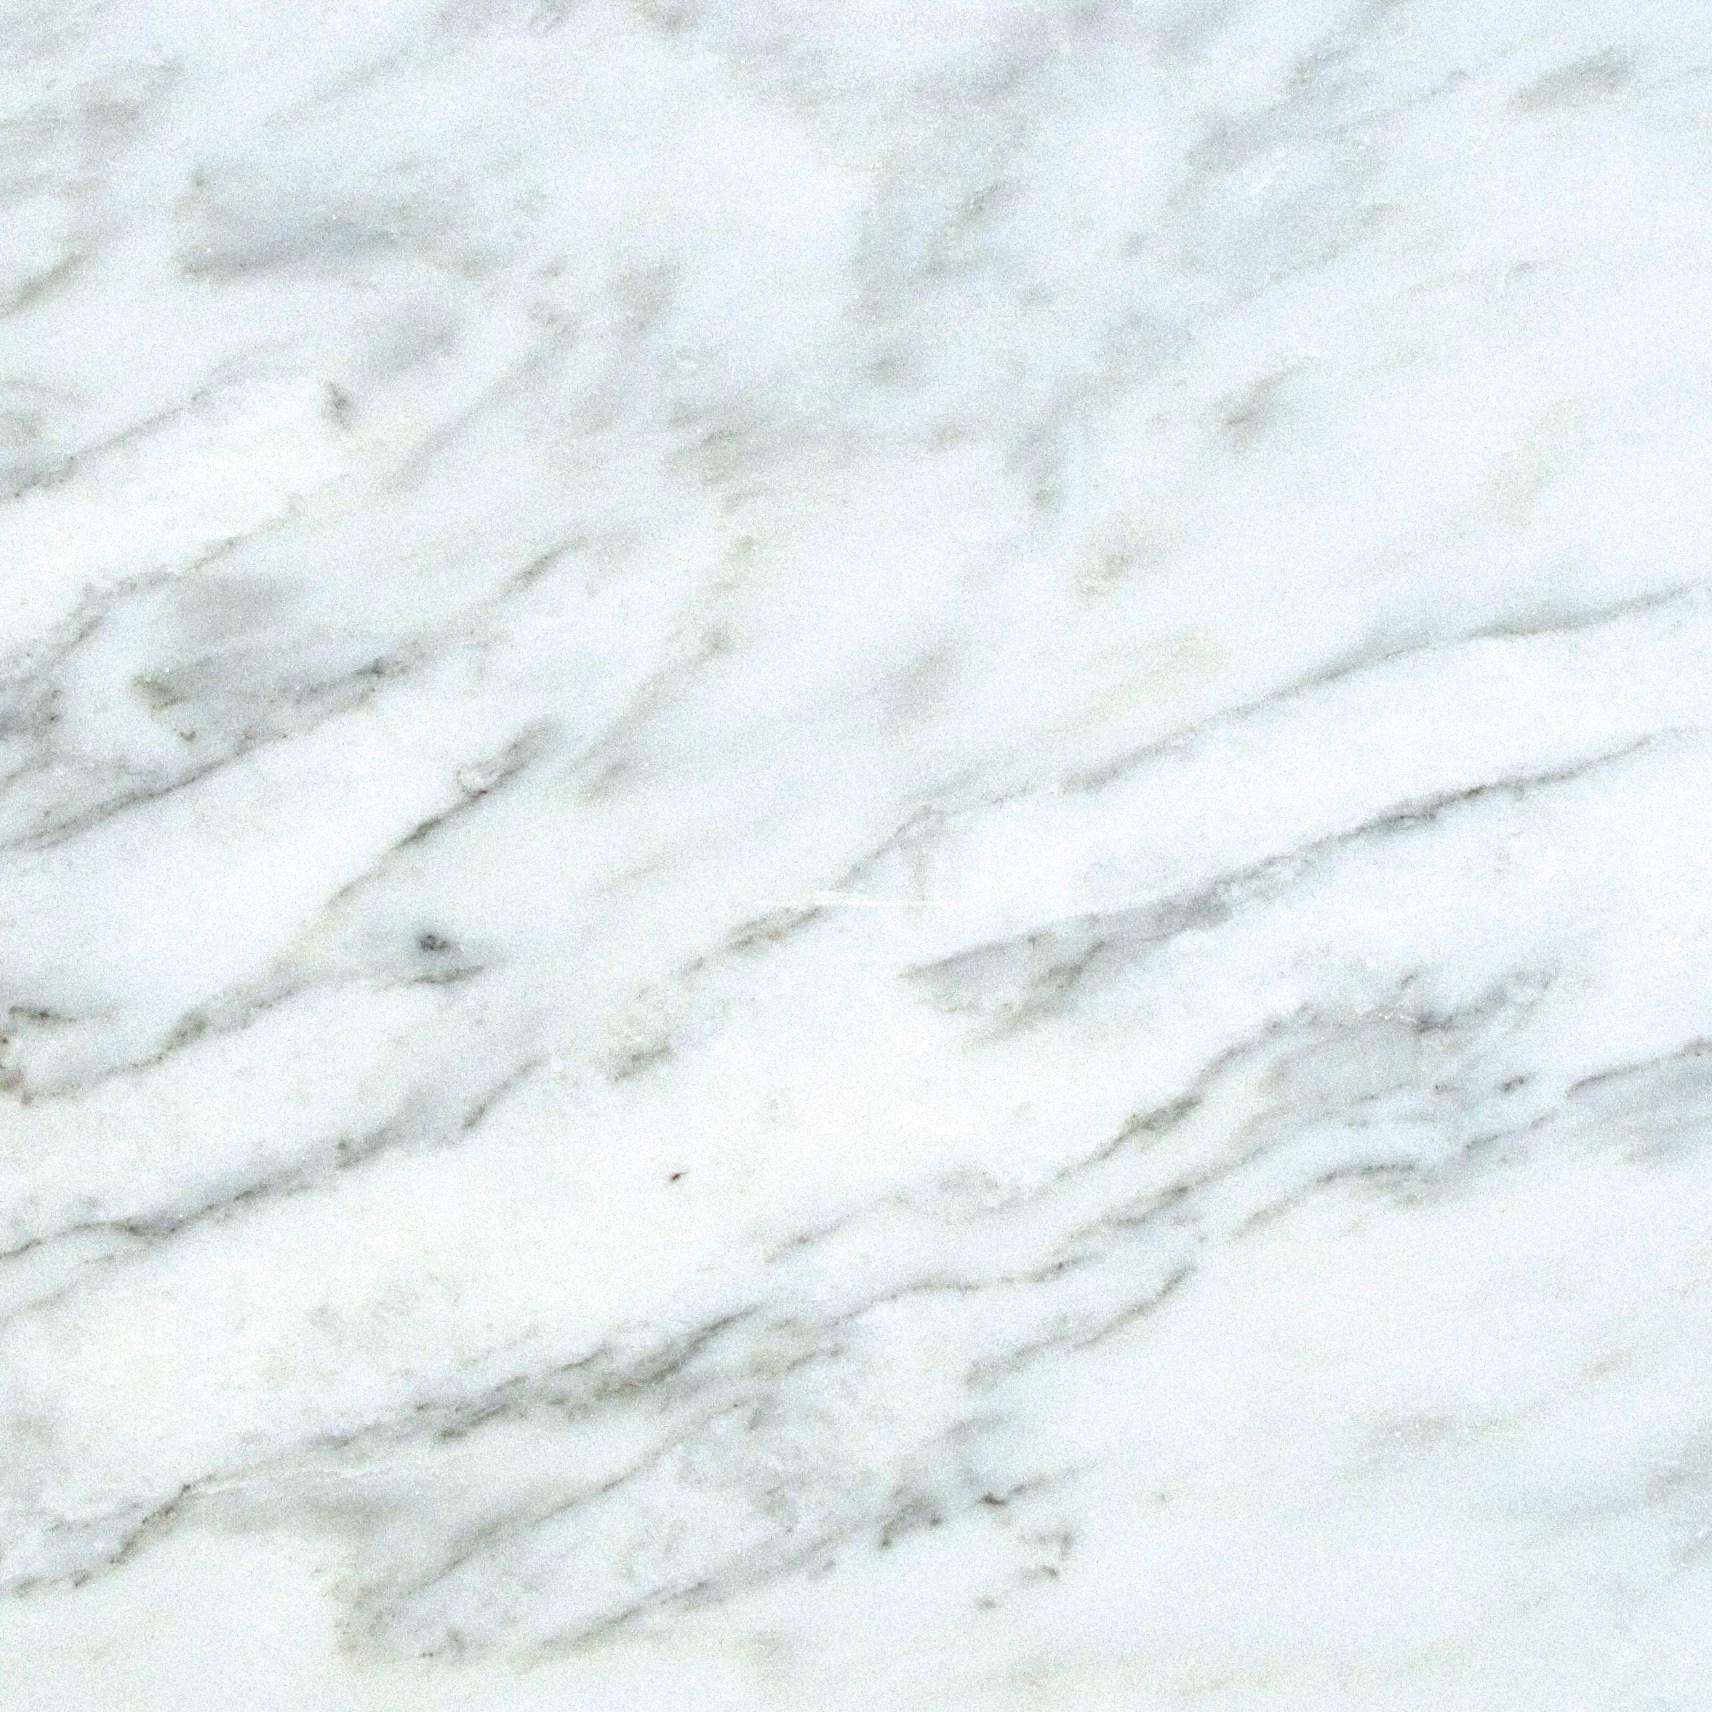 arabescato carrara 18 x 18 natural stone marble look wall floor tile